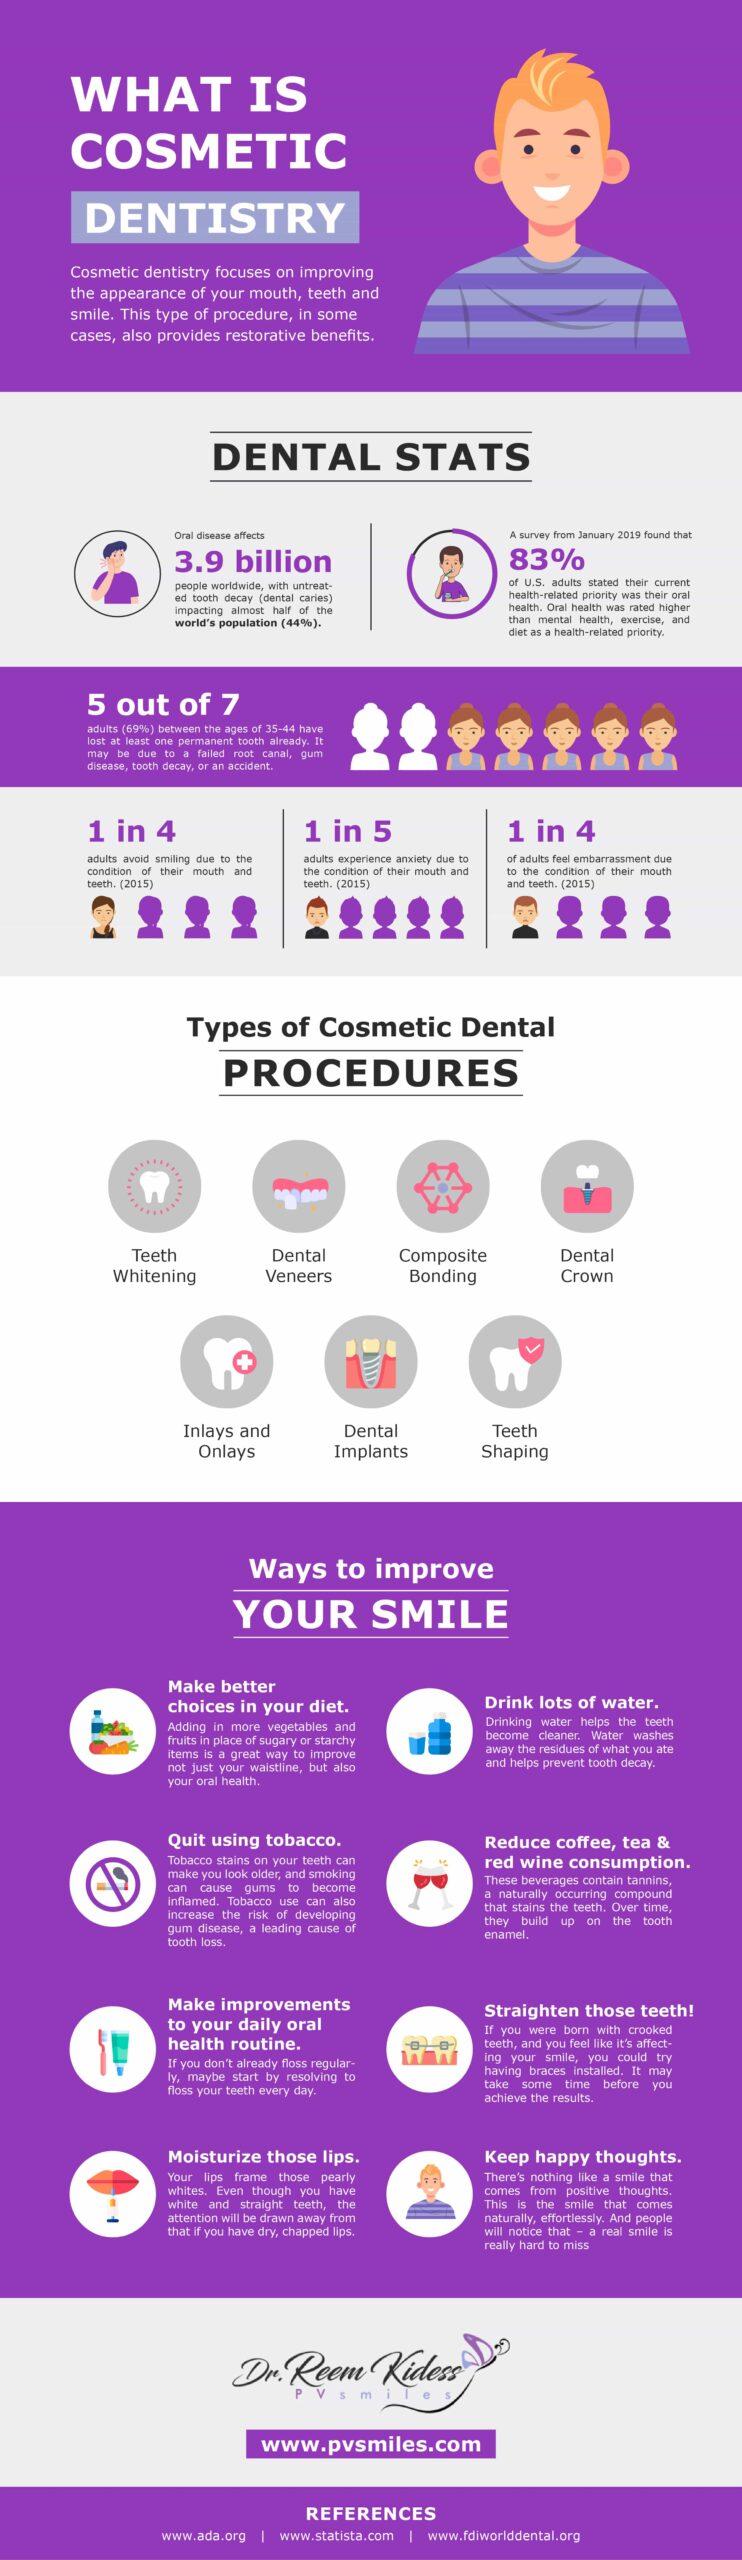 Scottsdale cosmetic dentist